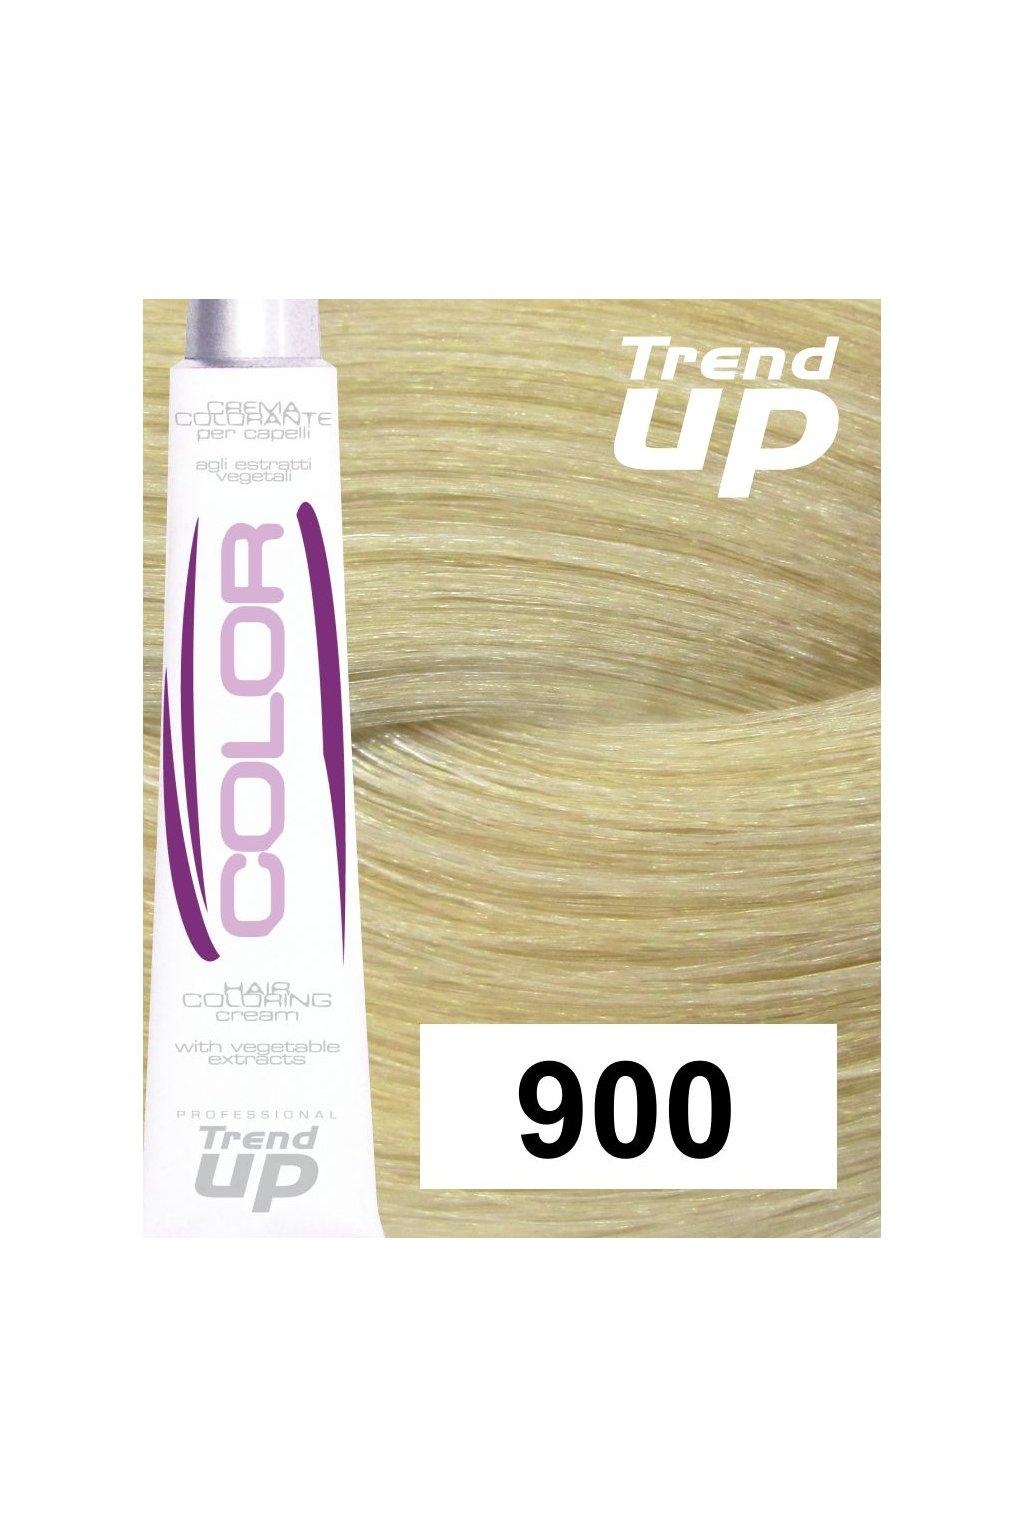 900 TU